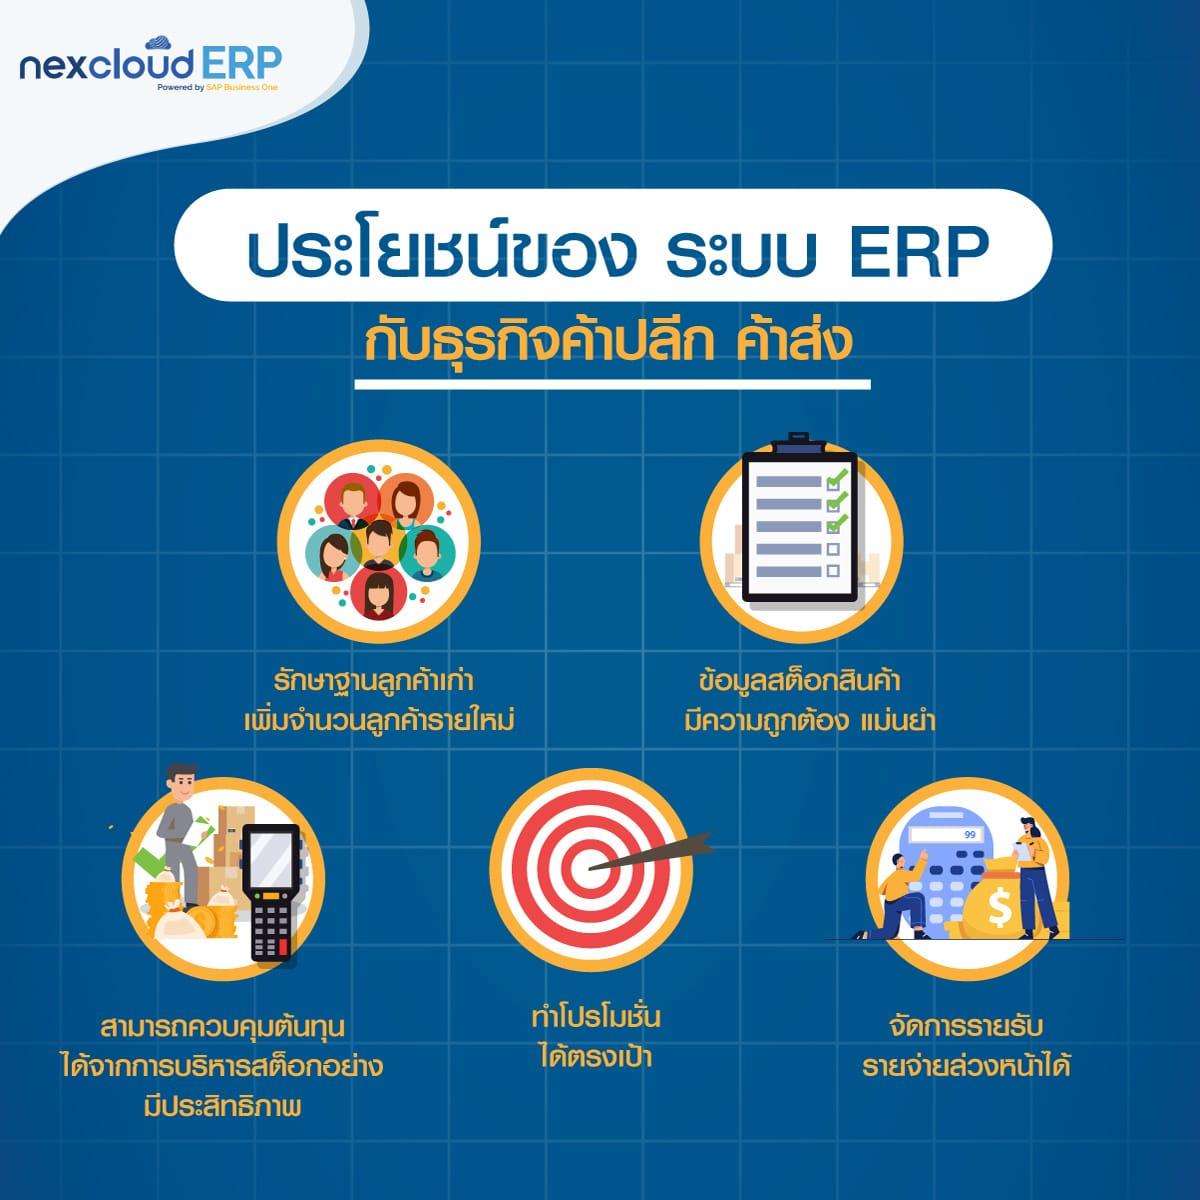 ERP ค้าปลีก ค้าส่ง ERP retail wholesale ธุรกิจ ค้าส่ง ค้าปลีก ราคาไม่แพง โมดูล ครอบคลุม สำหรับ SMEs ไทย